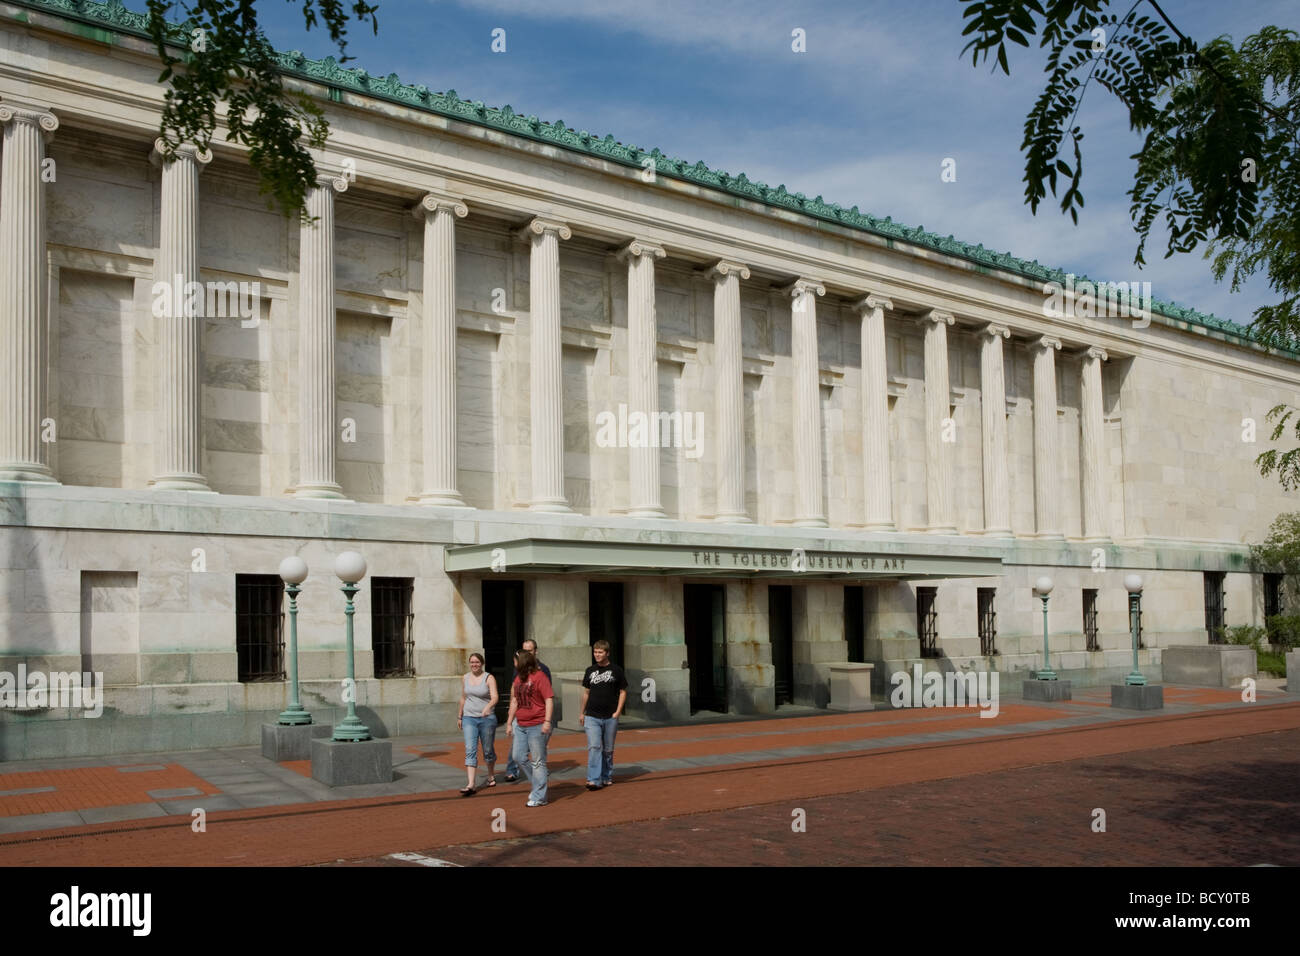 The Toledo Museum of Art Toledo Ohio - Stock Image